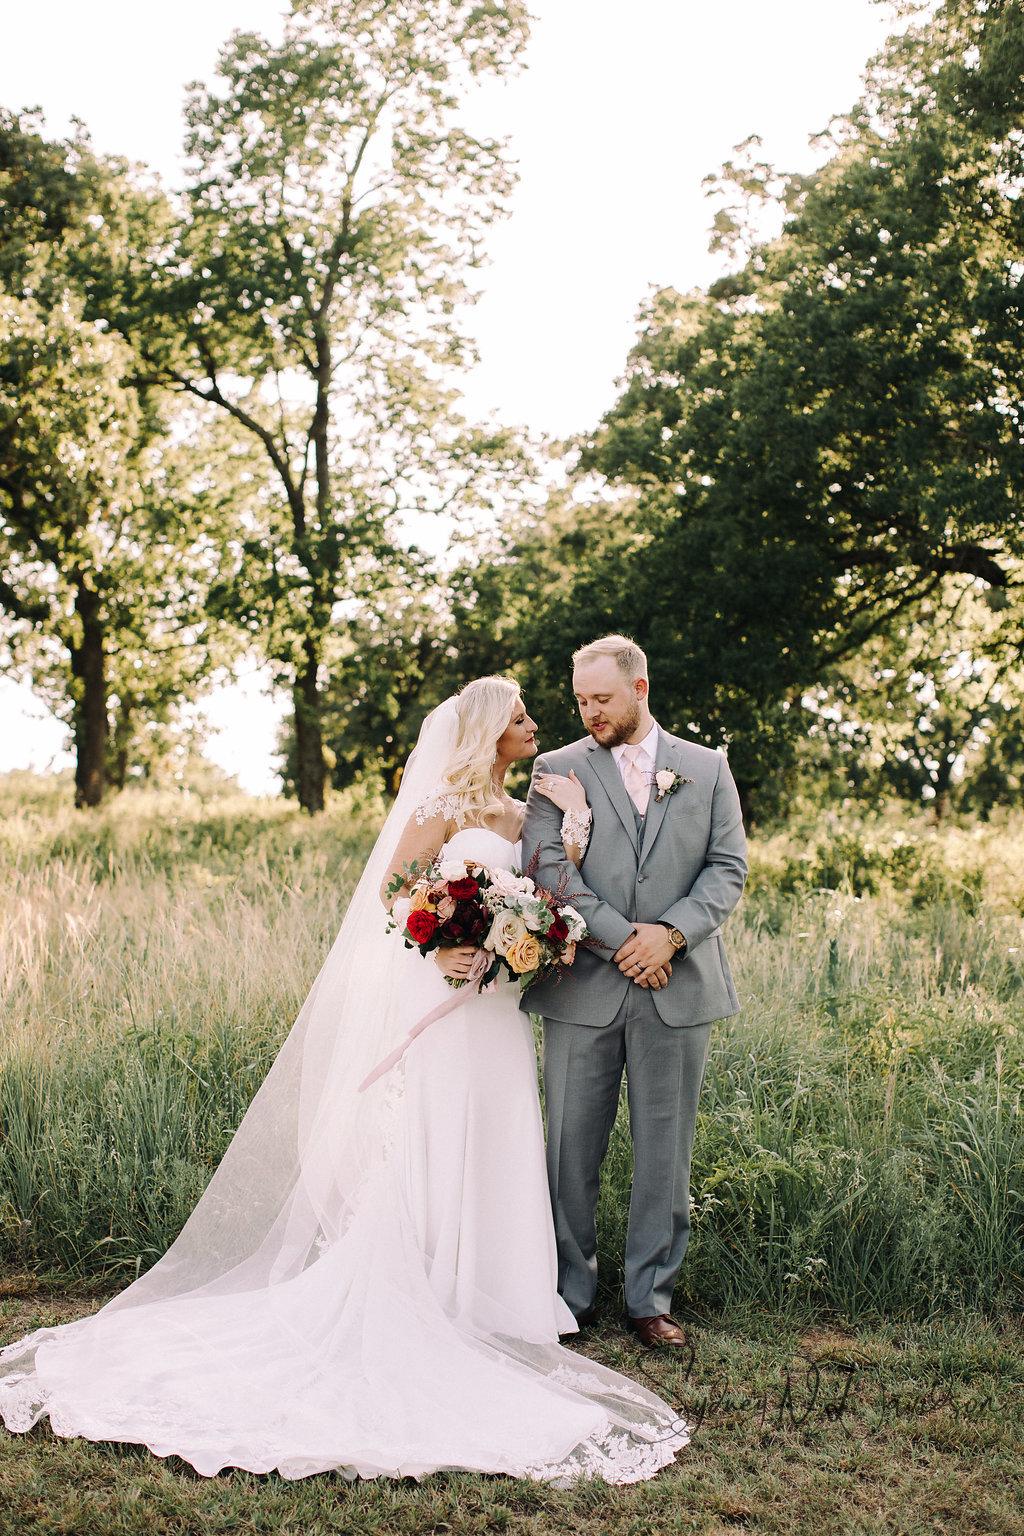 sydney-davidson-wedding-stillwater-oklahoma-wedding-session-traveling-photographer-portrait-tulsa-oklahoma-3458.jpg